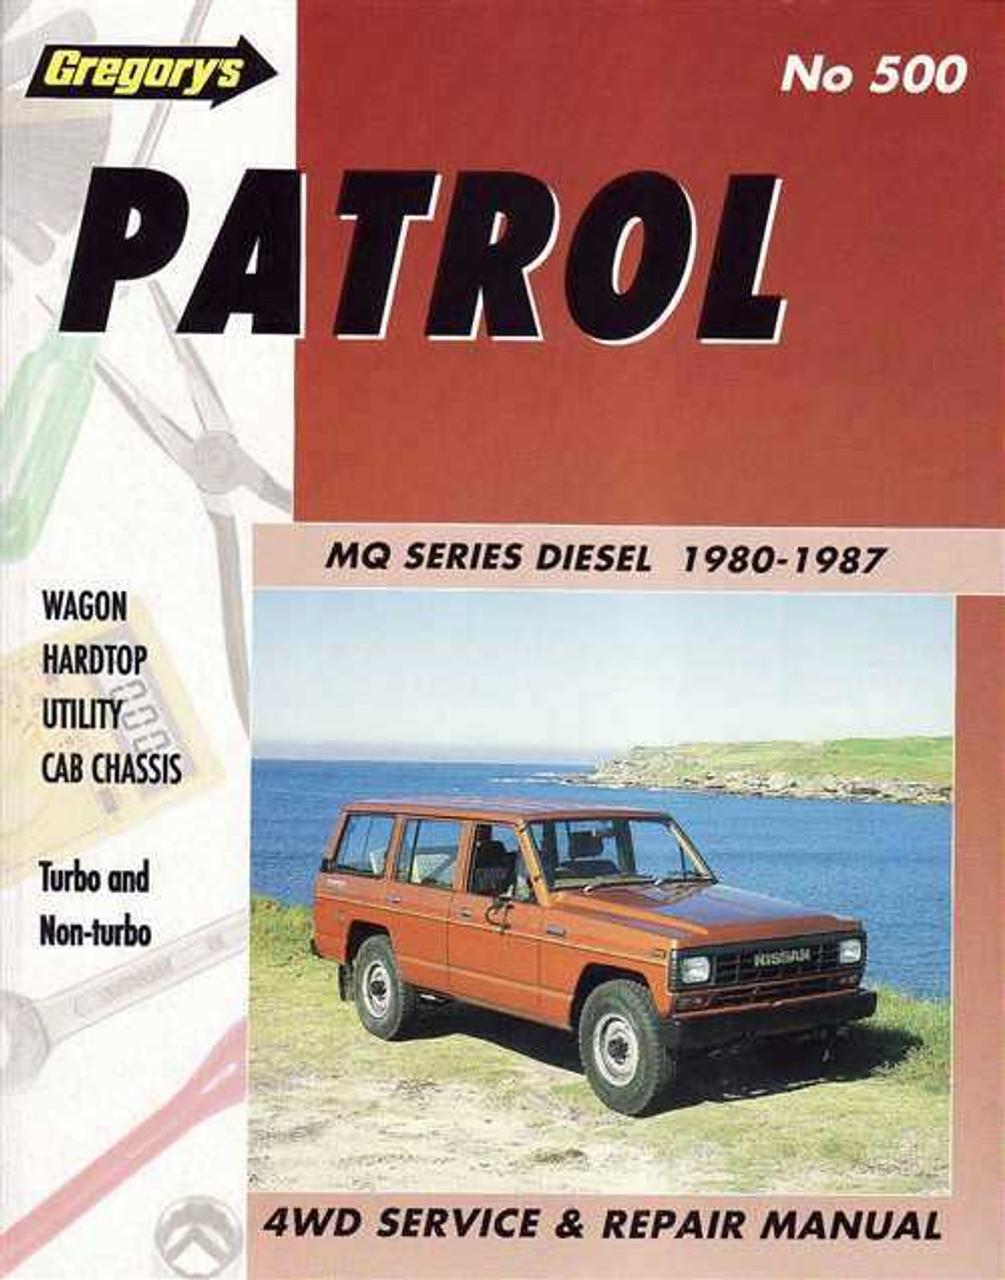 nissan patrol mq series 1980 1987 workshop manual rh automotobookshop com au gq patrol service manual - y60 nissan patrol y61 service manual pdf